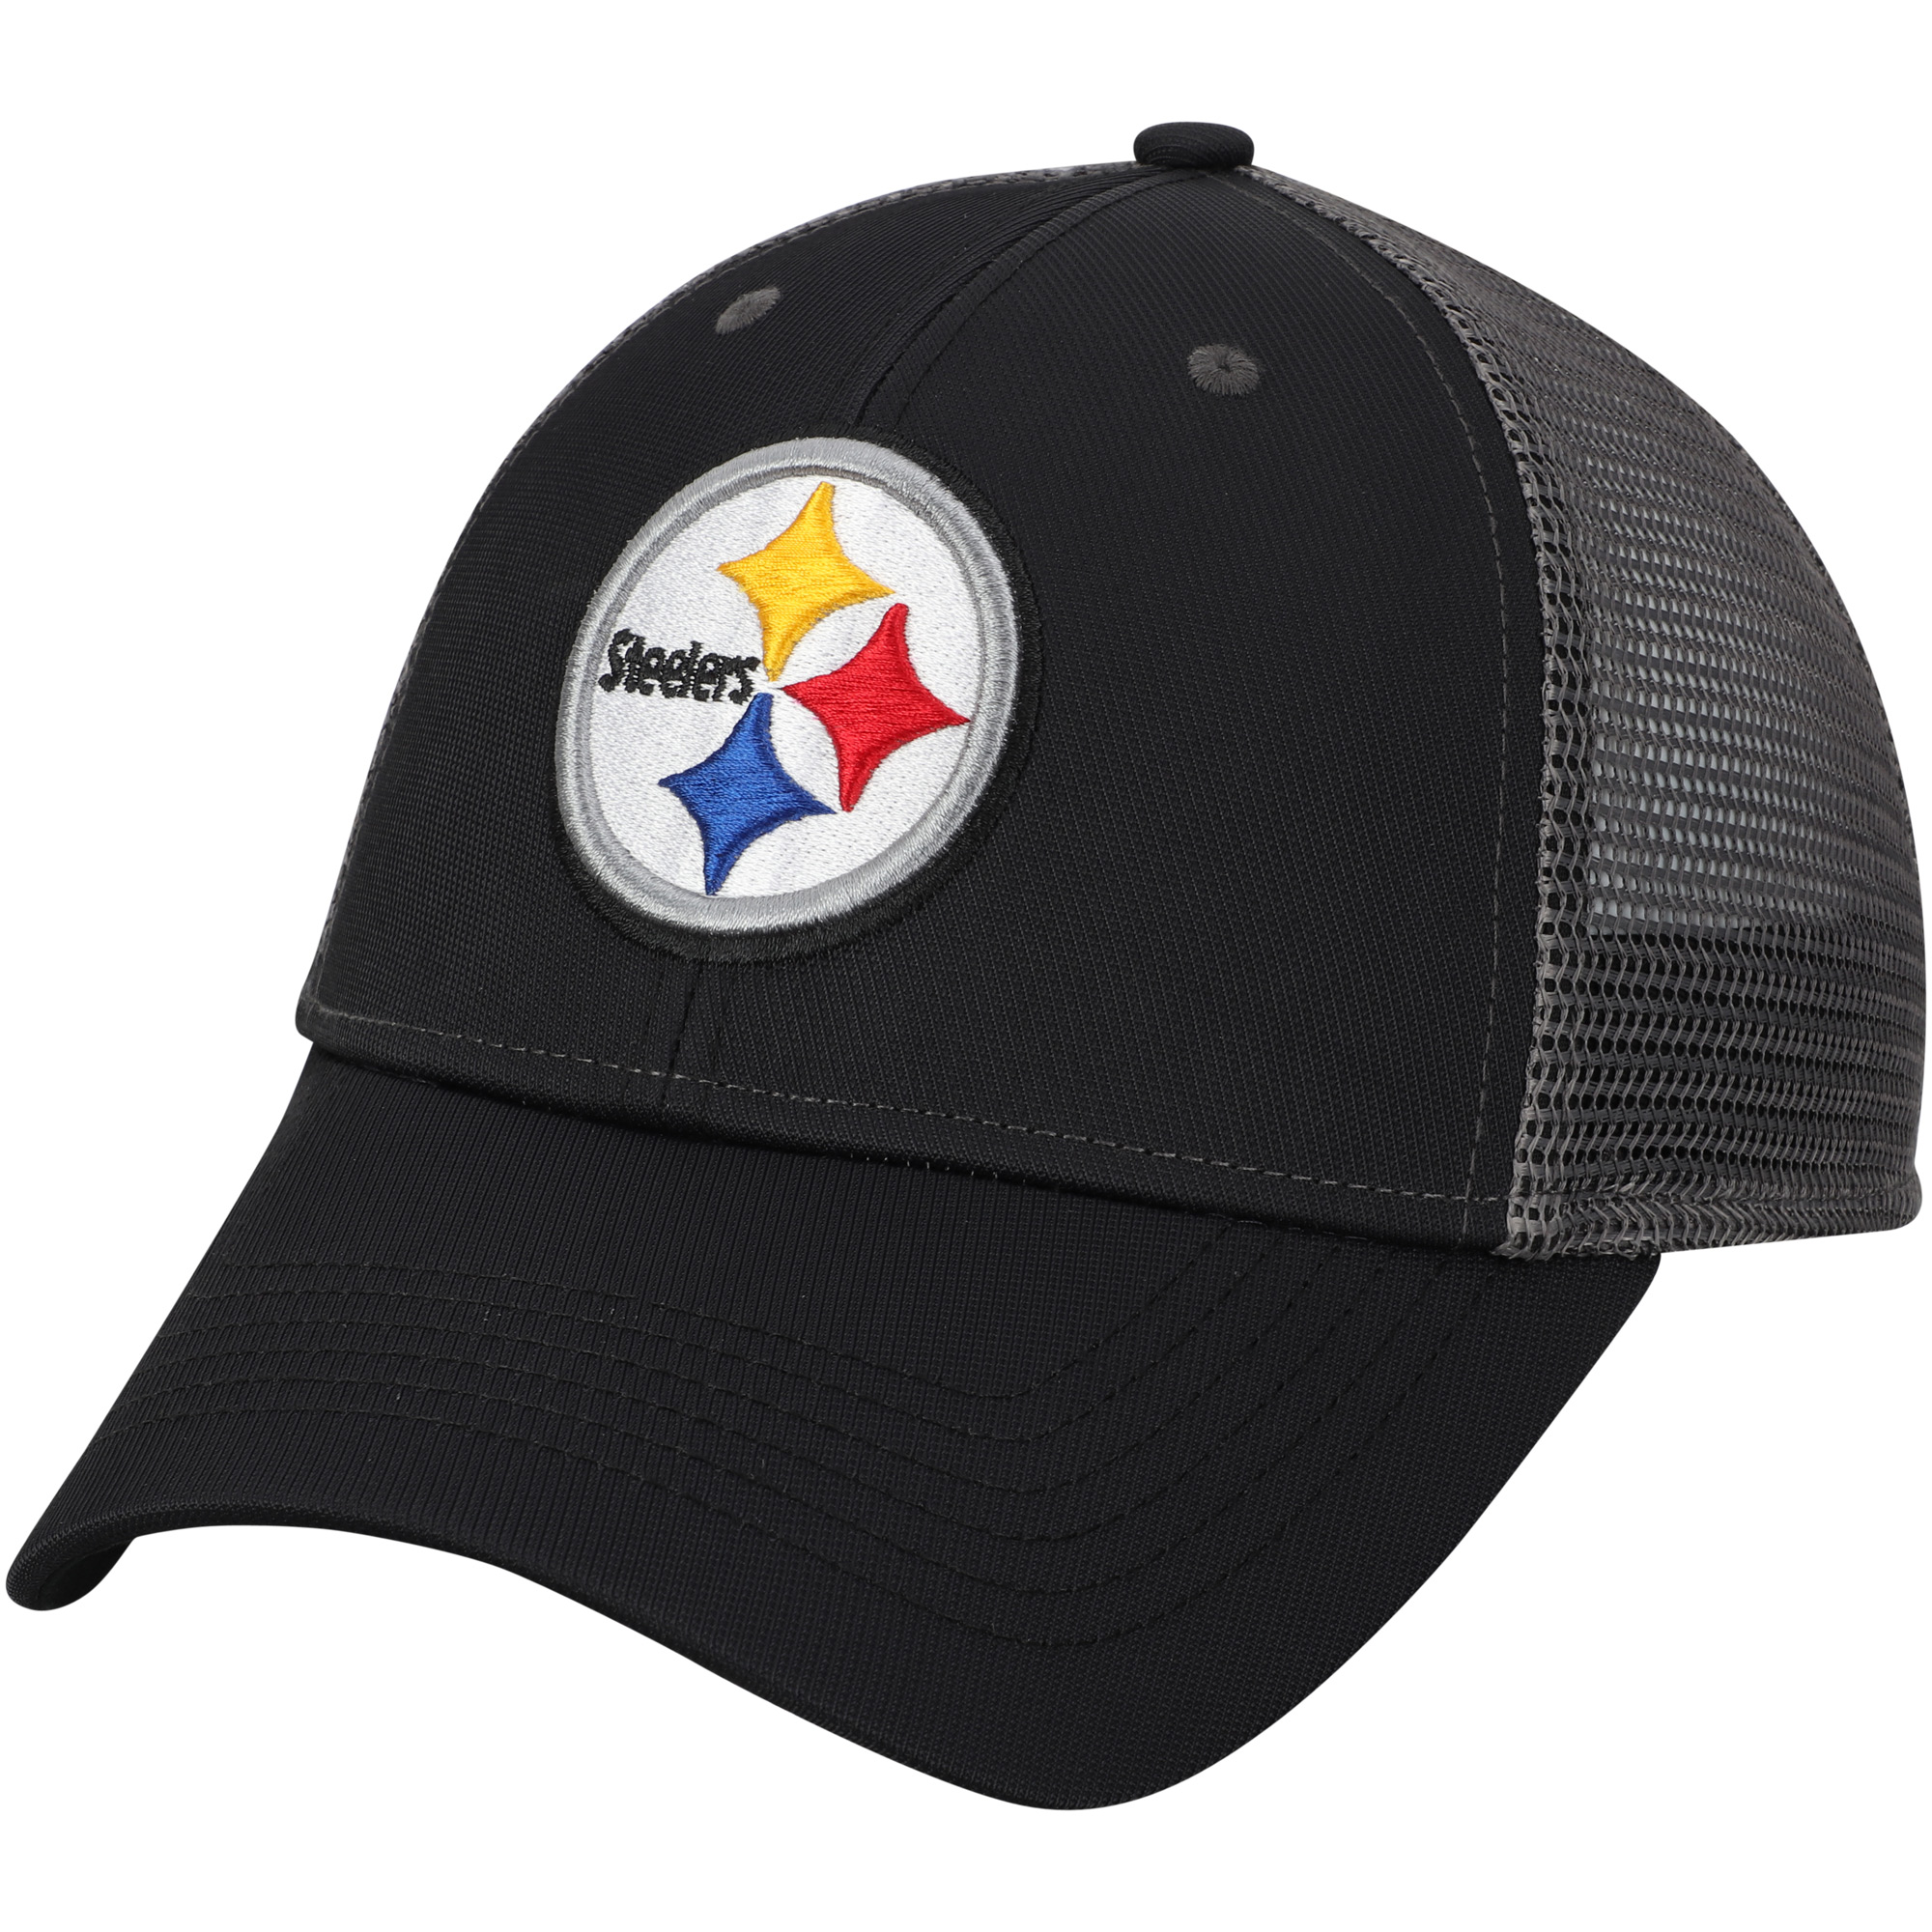 Men's Black Pittsburgh Steelers Explore Adjustable Hat - OSFA